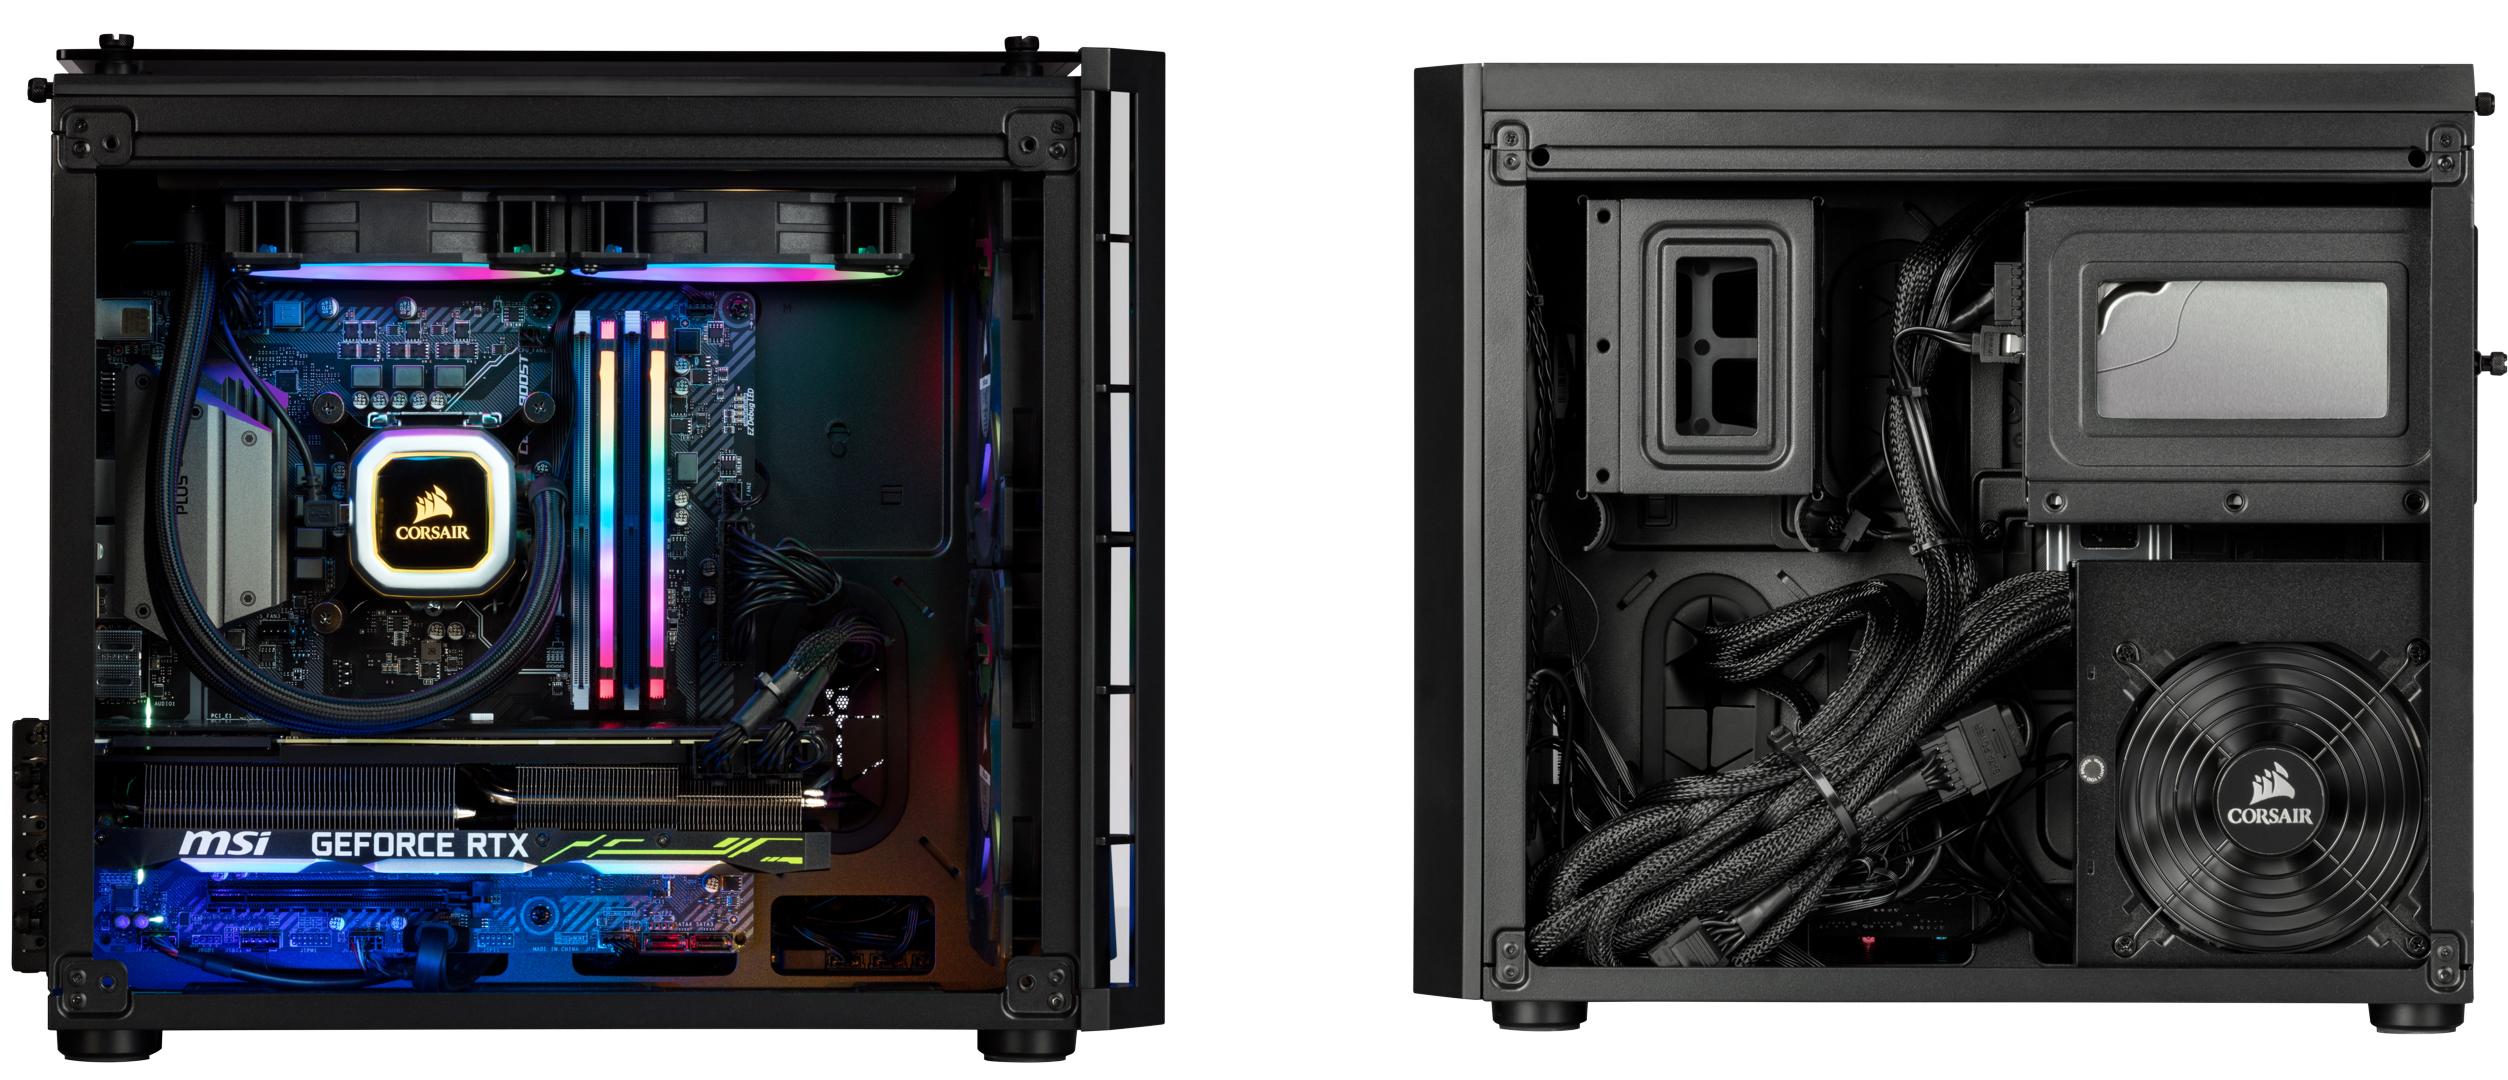 Corsair's Vengeance 5185 PC: Core i7-9700K + GeForce RTX